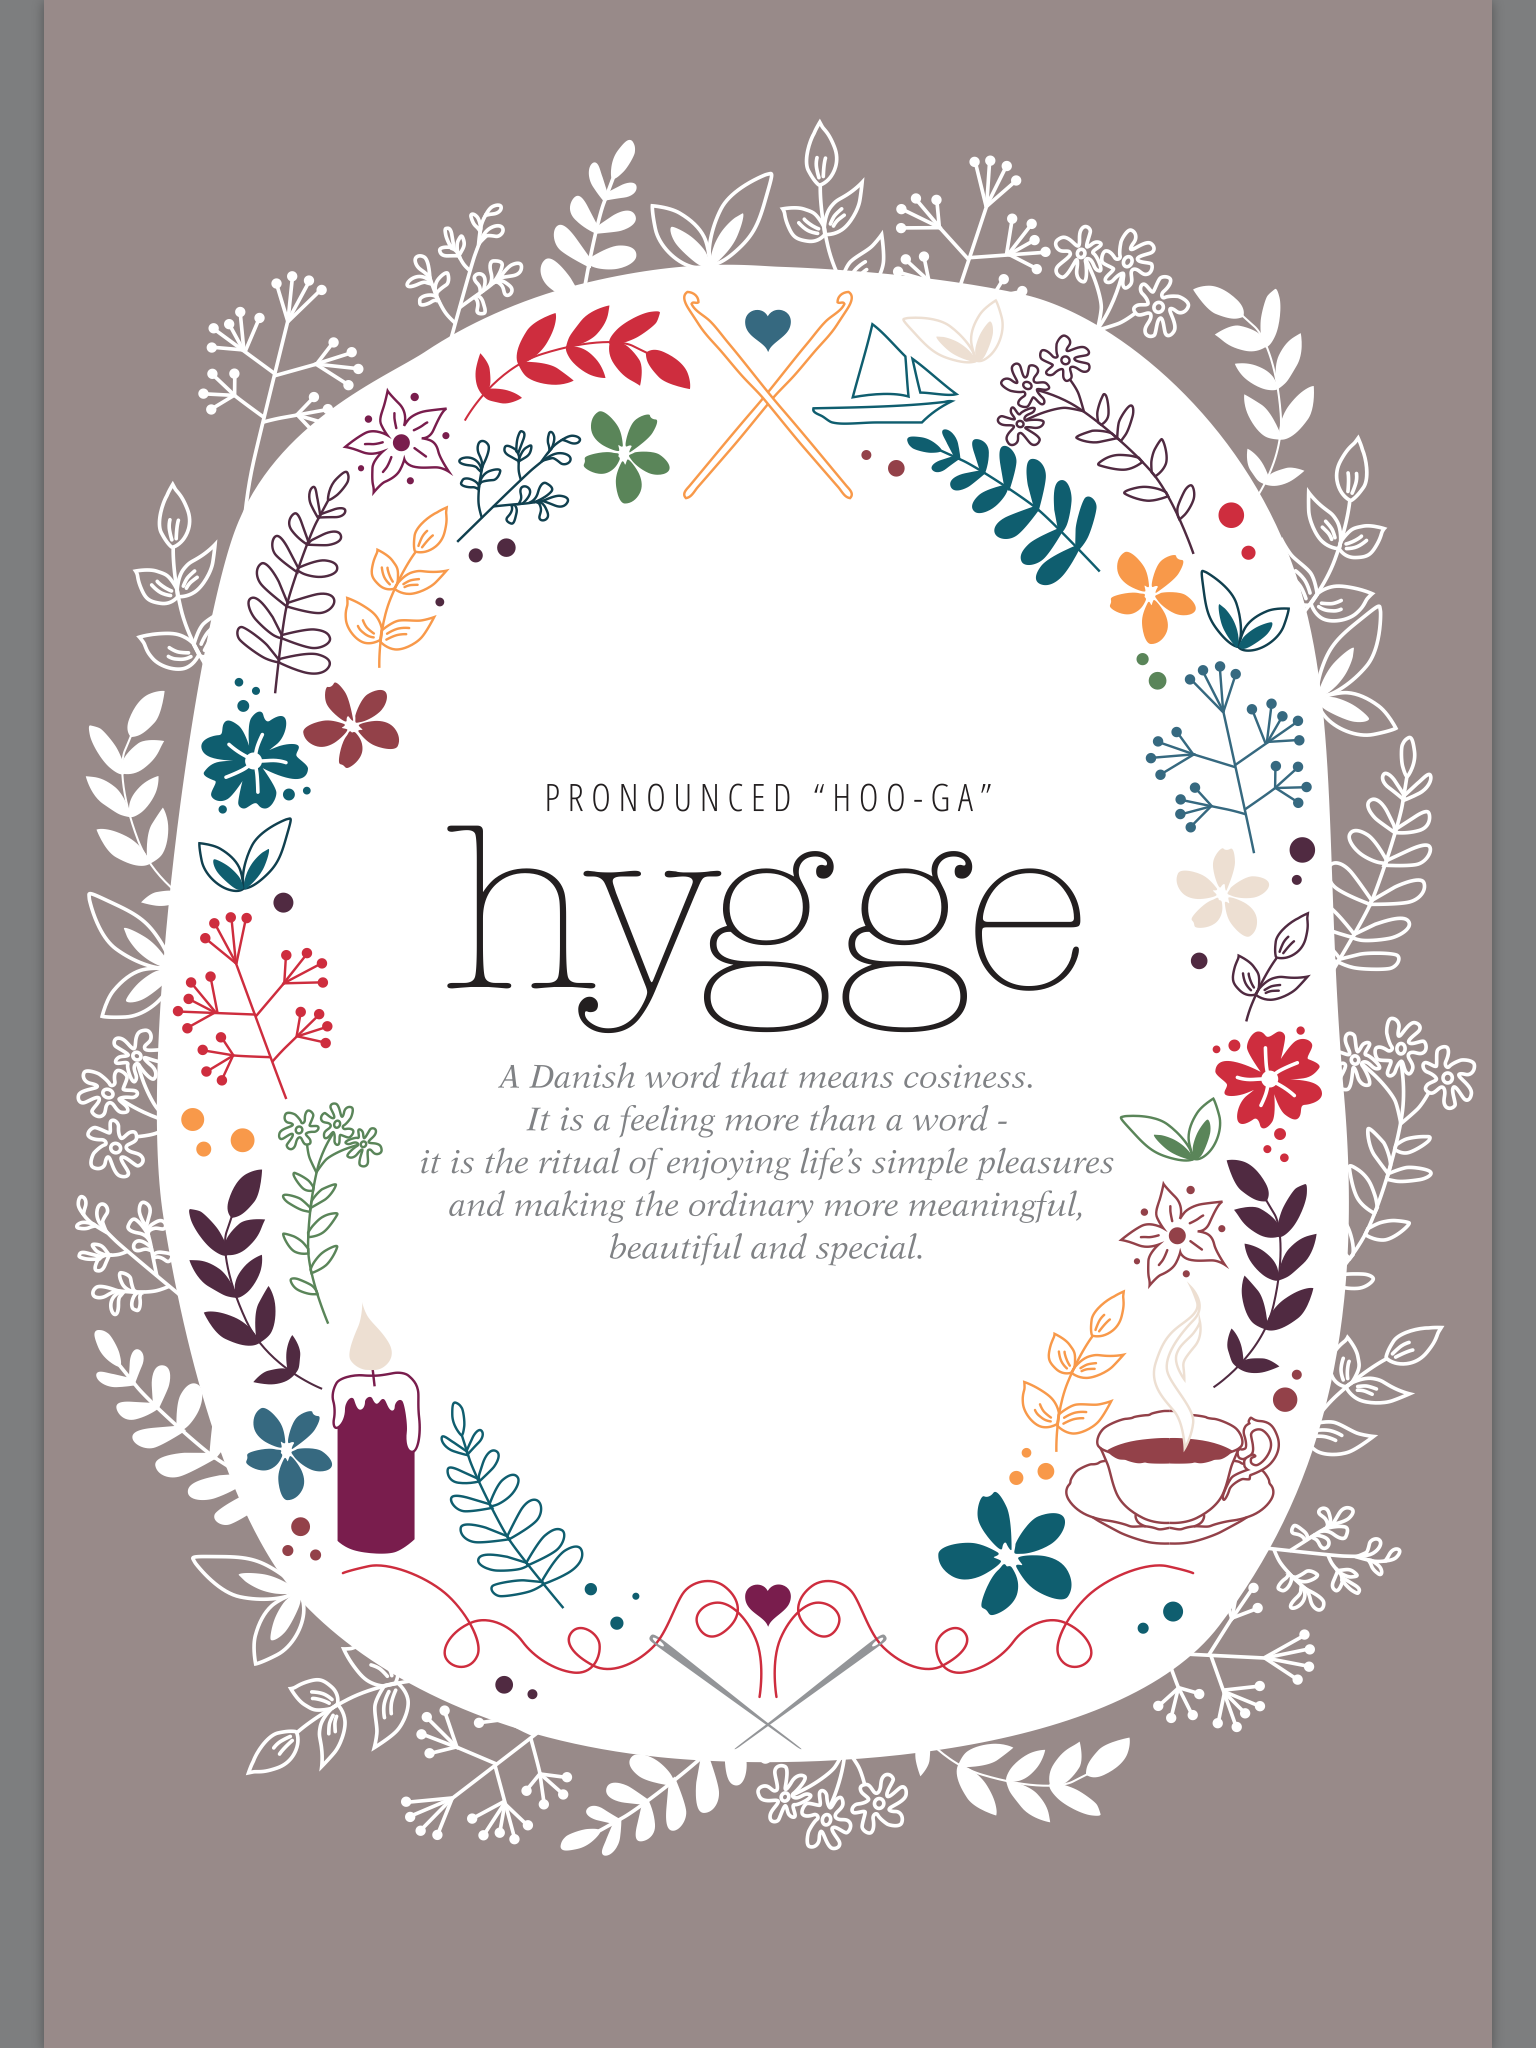 Pin by Becky Turner on Crochet: CAL | Pinterest | Hygge ...